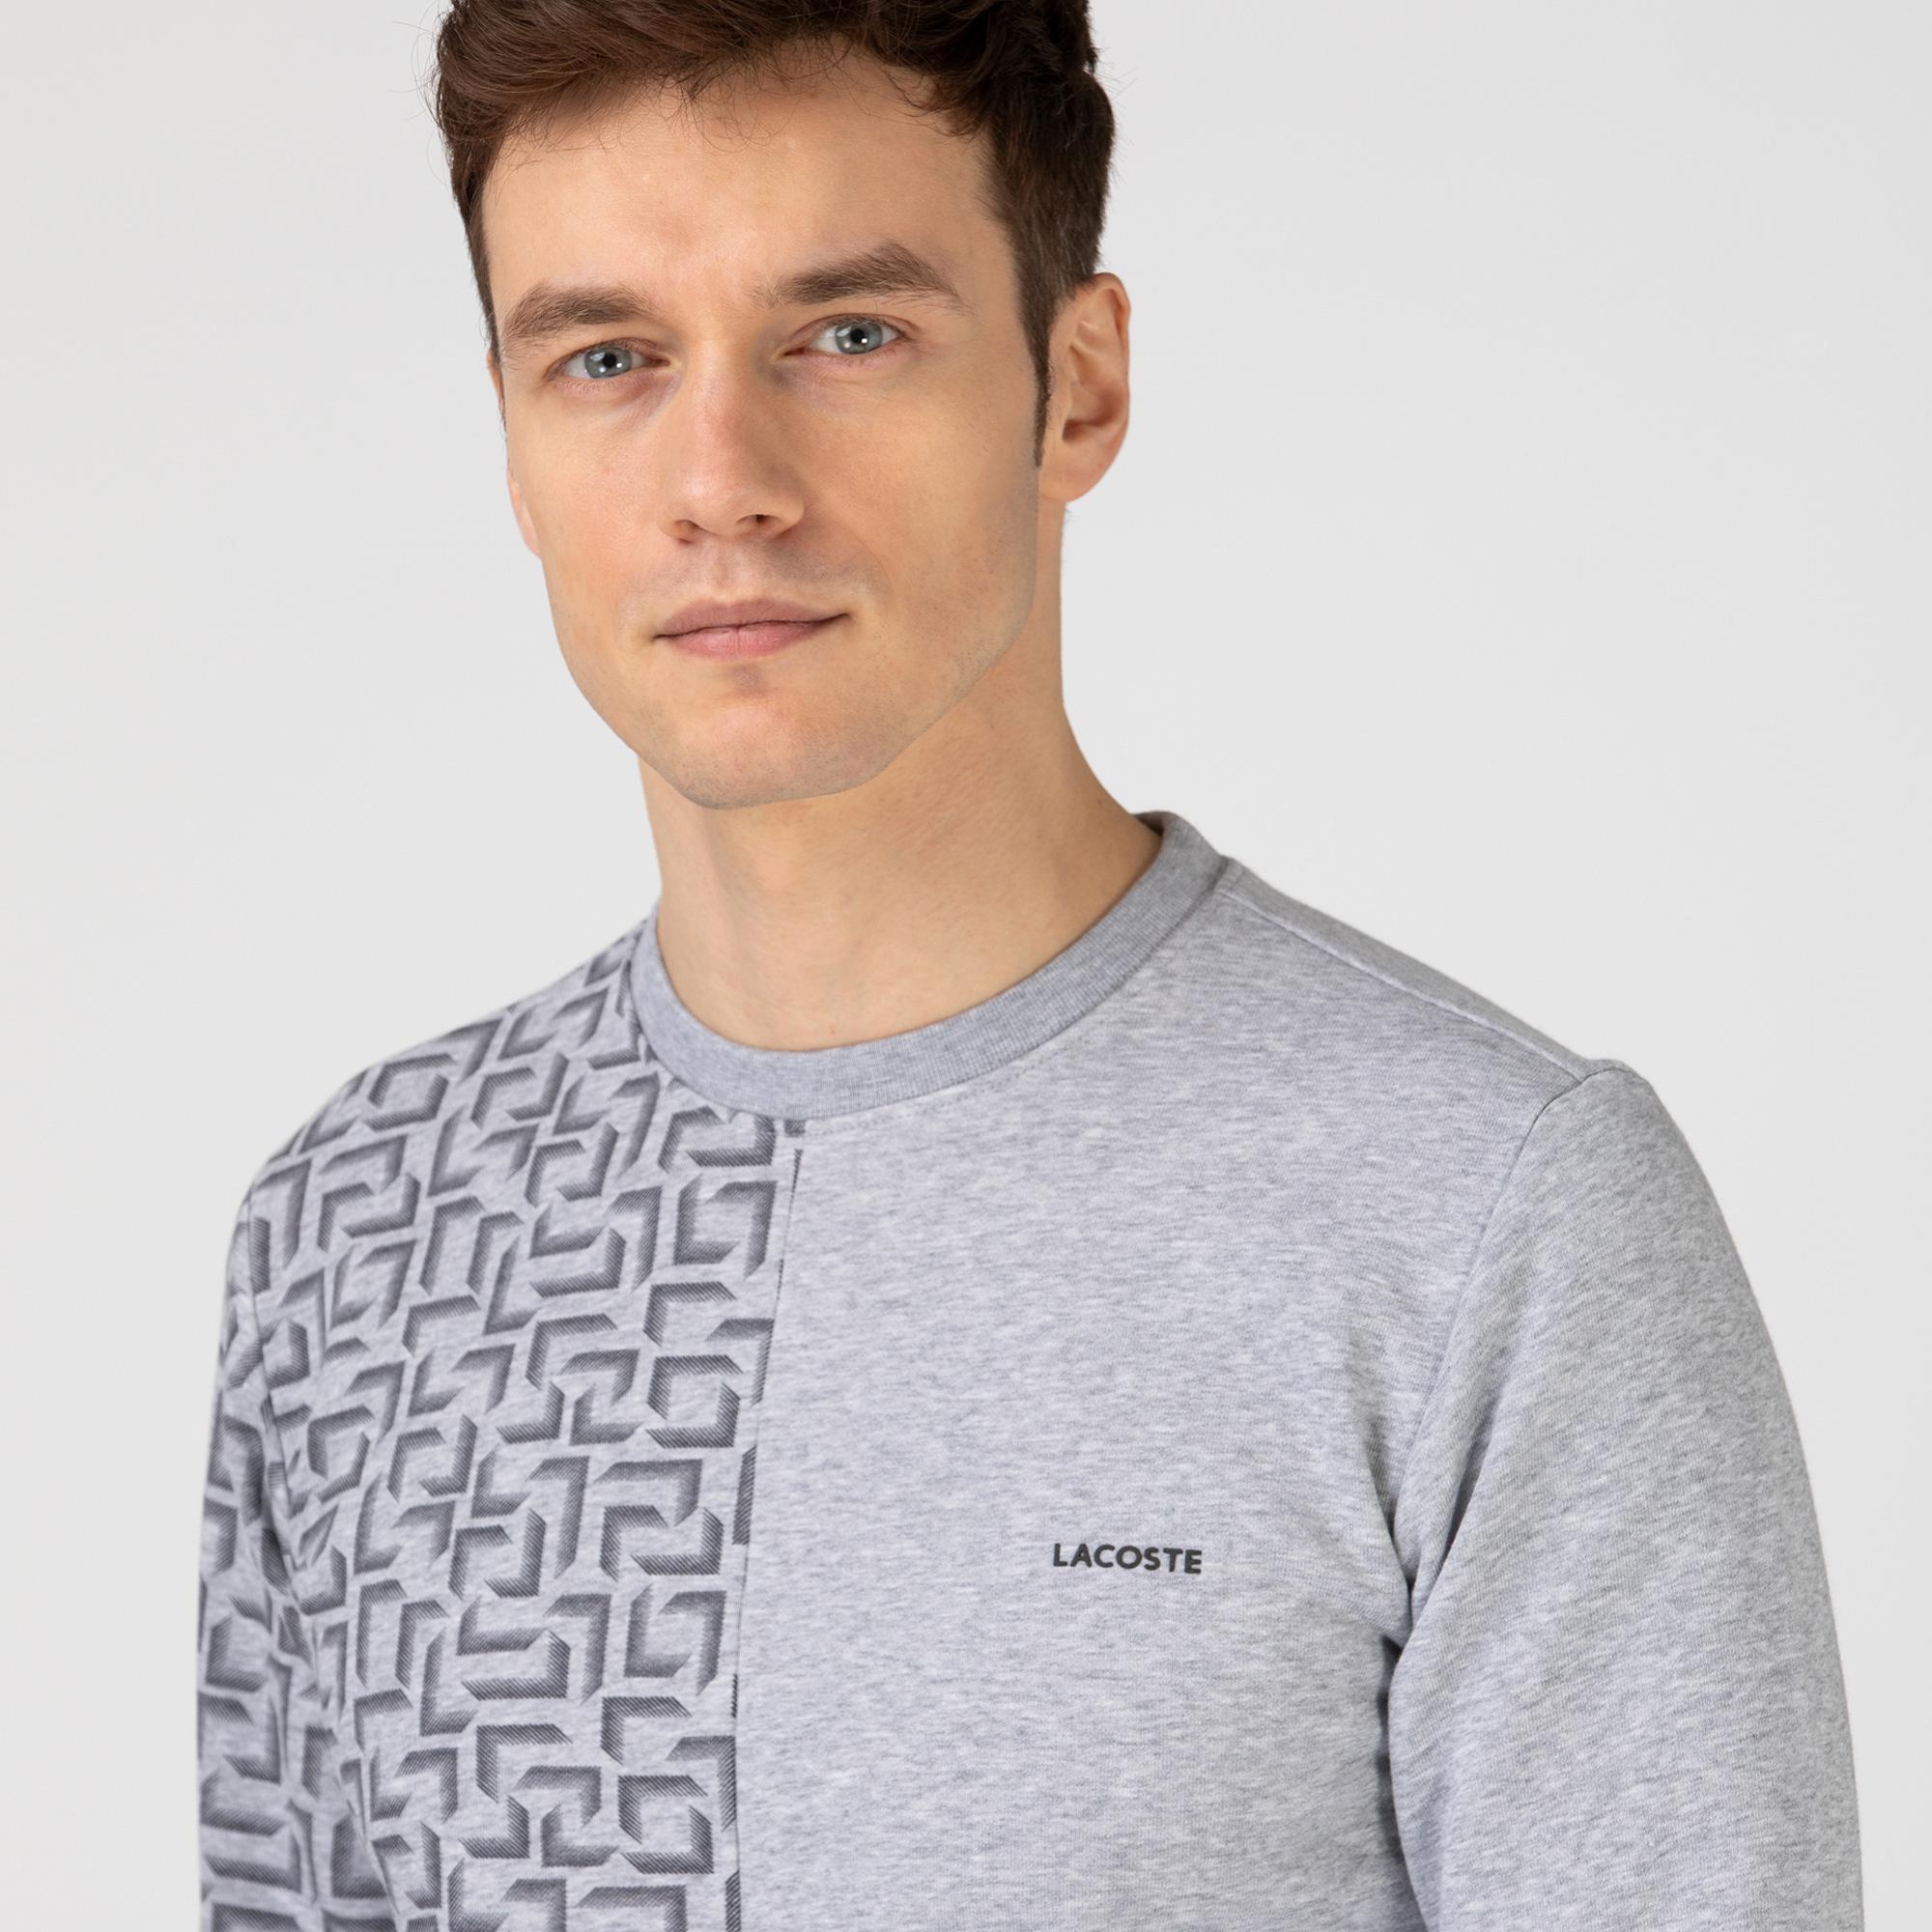 Lacoste Erkek Bisiklet Yaka Desenli Gri Sweatshirt